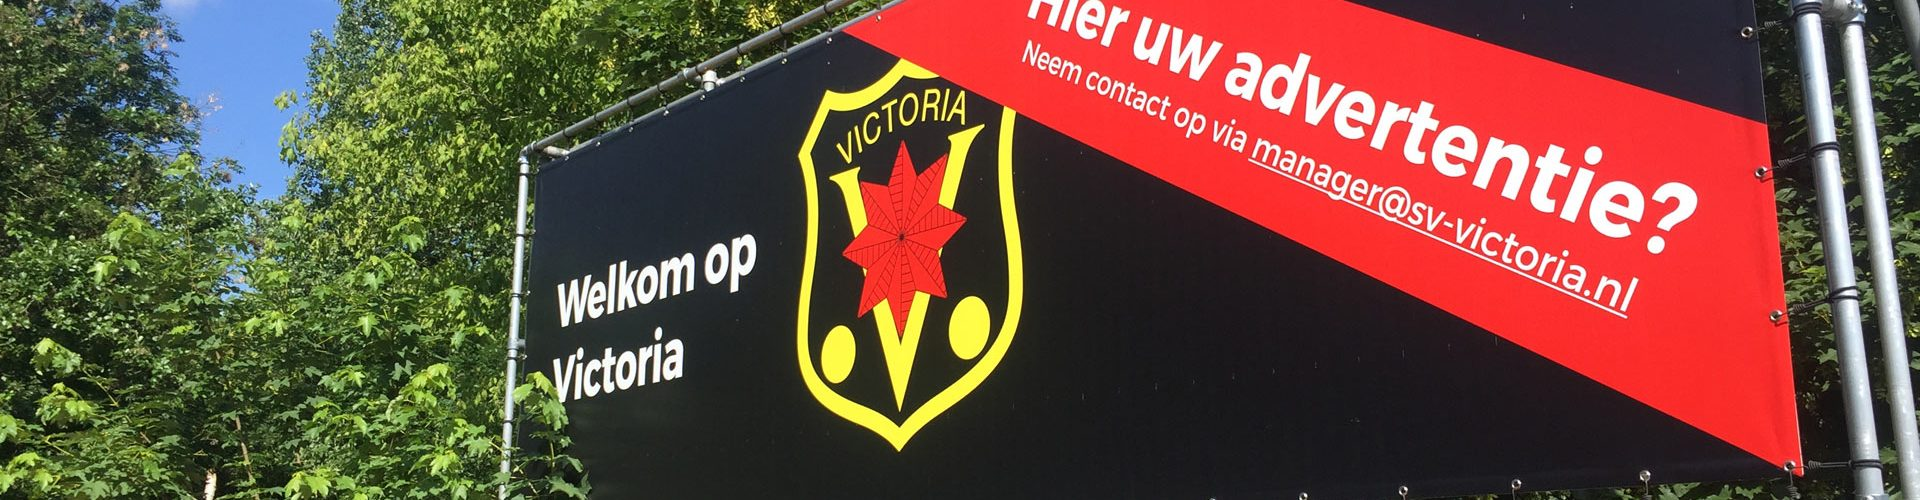 VV Victoria sportsigning